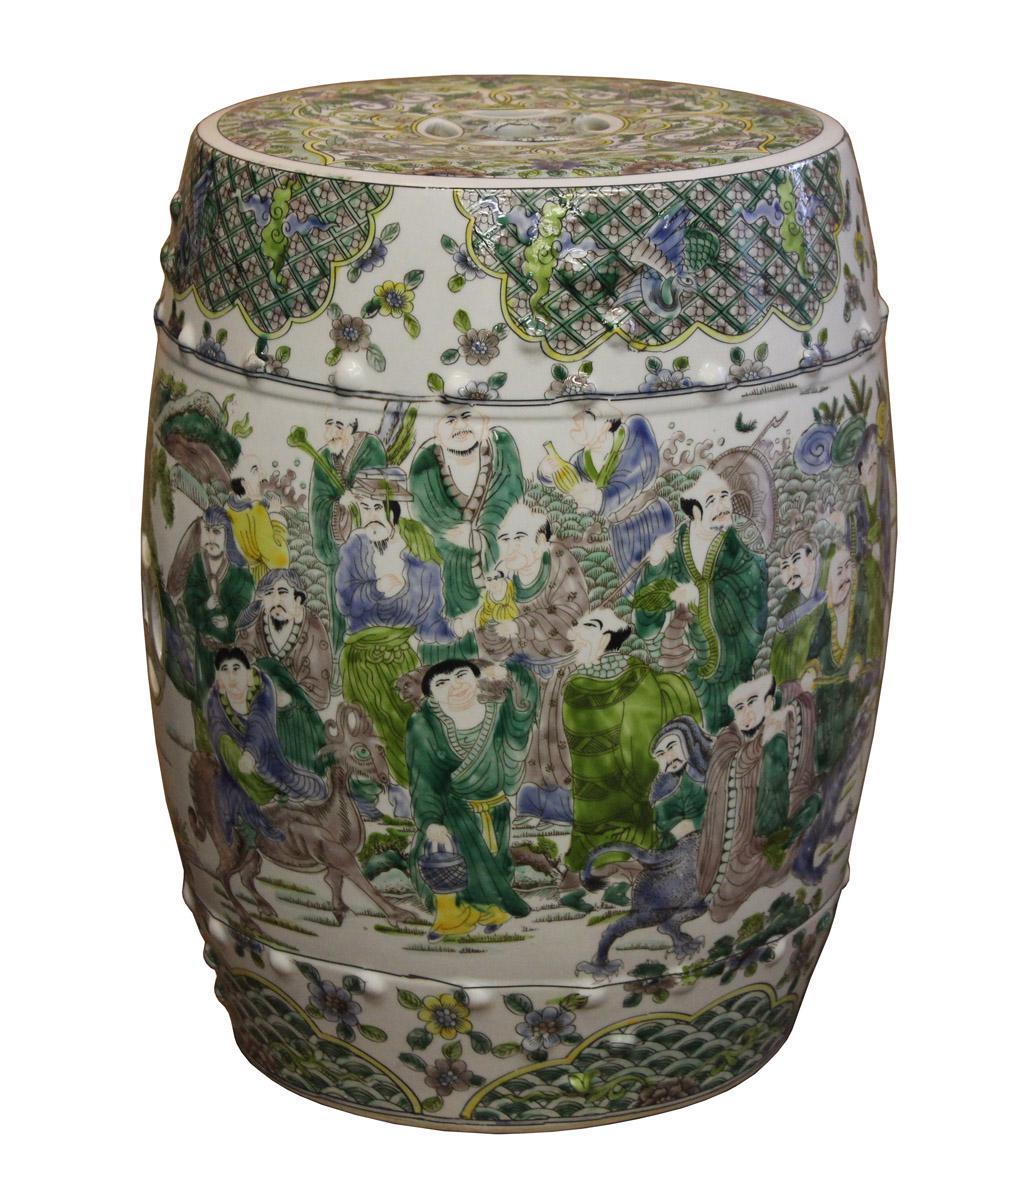 Chinese Porcelain Garden Stool Chairish